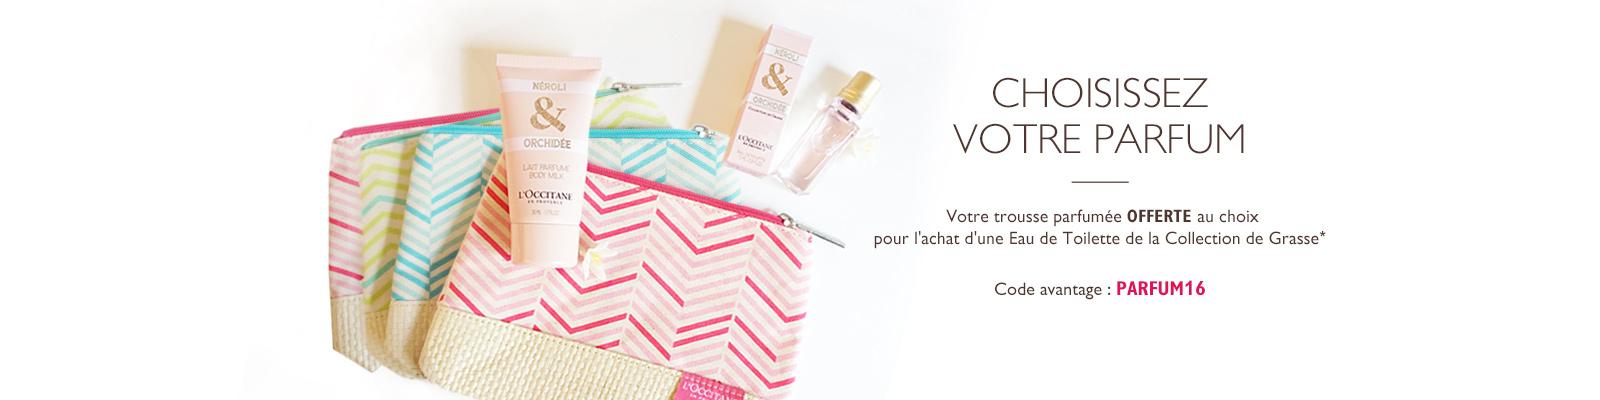 Offre Parfum - L'Occitane